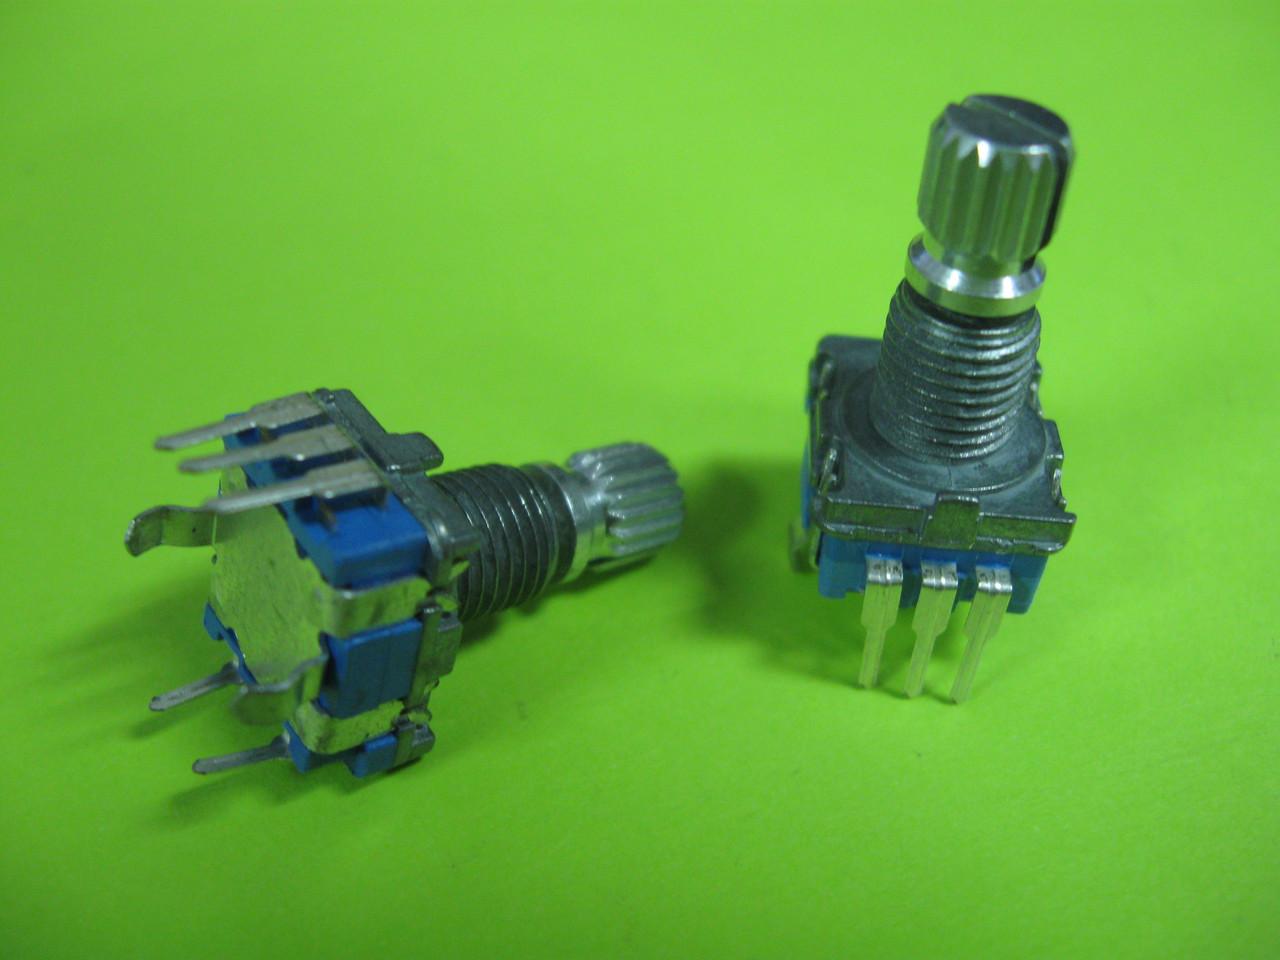 Энкодер для аудиотехники RE(11) EC11 360° вращение, 5 pin с кнопкой, L=15mm - RadioStore в Днепре